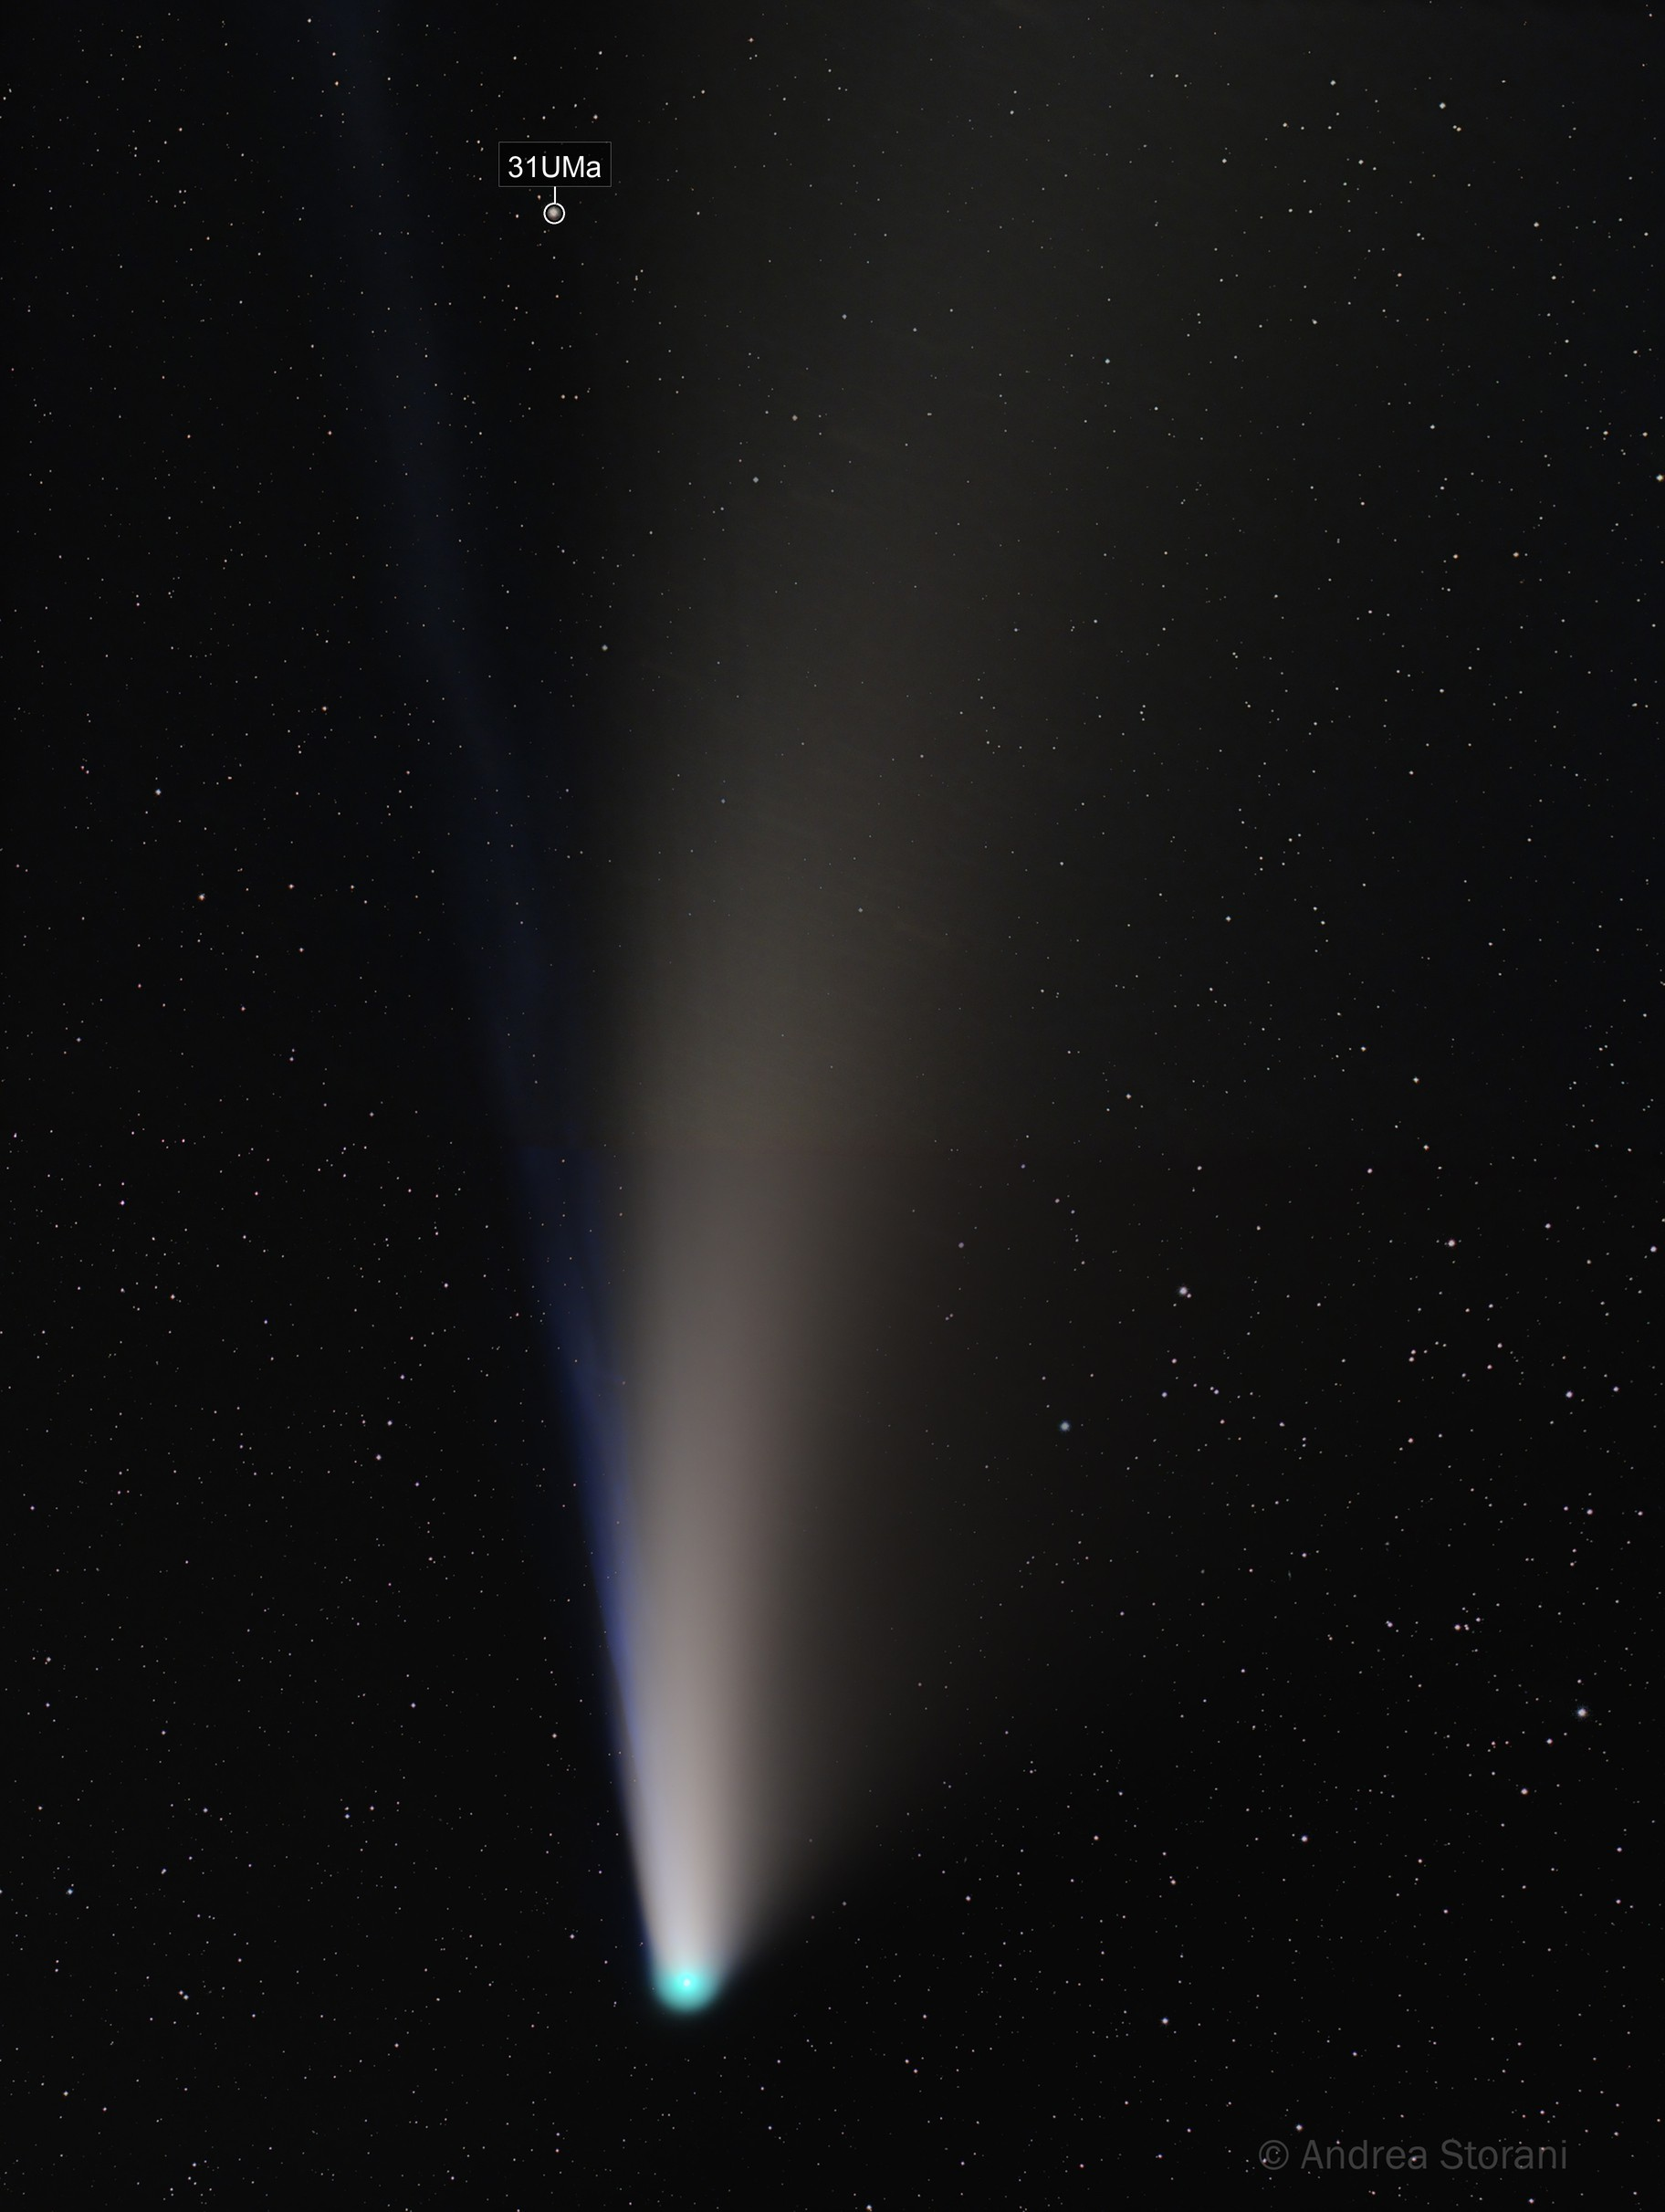 Comet C/2020 F3 NEOWISE 21/07/2020 (2 panel mosaic) - magnitude 3.0